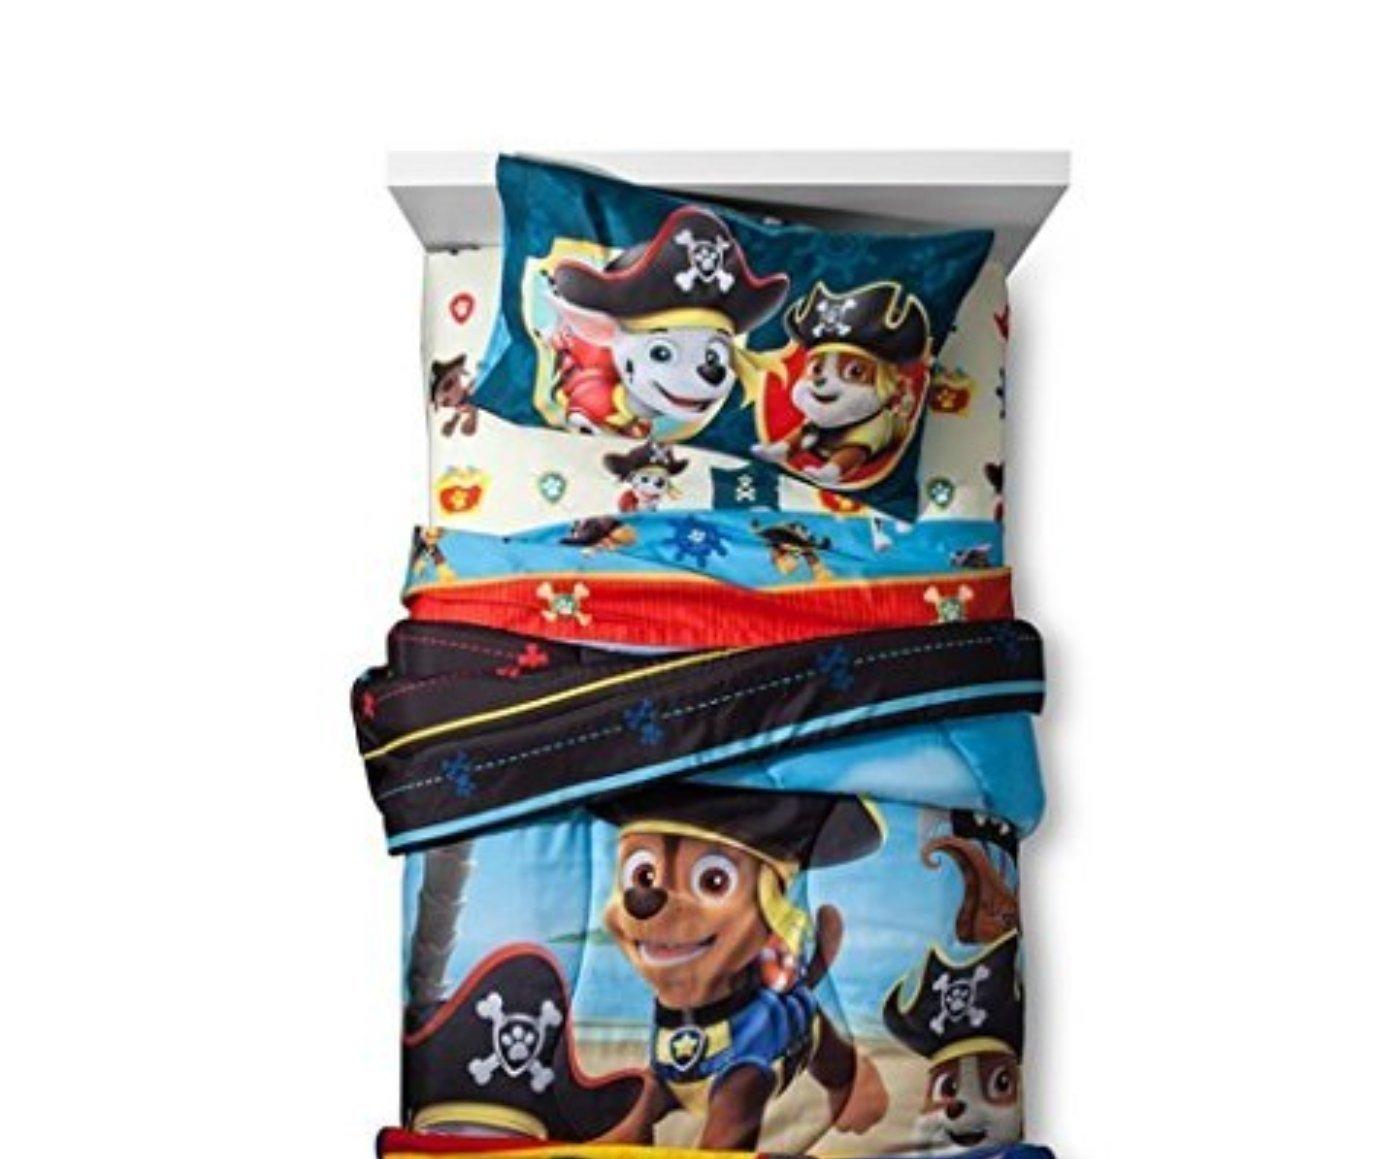 Paw Patrol Pirate子犬Full Comforter Set with Throw B076N5KJYJ